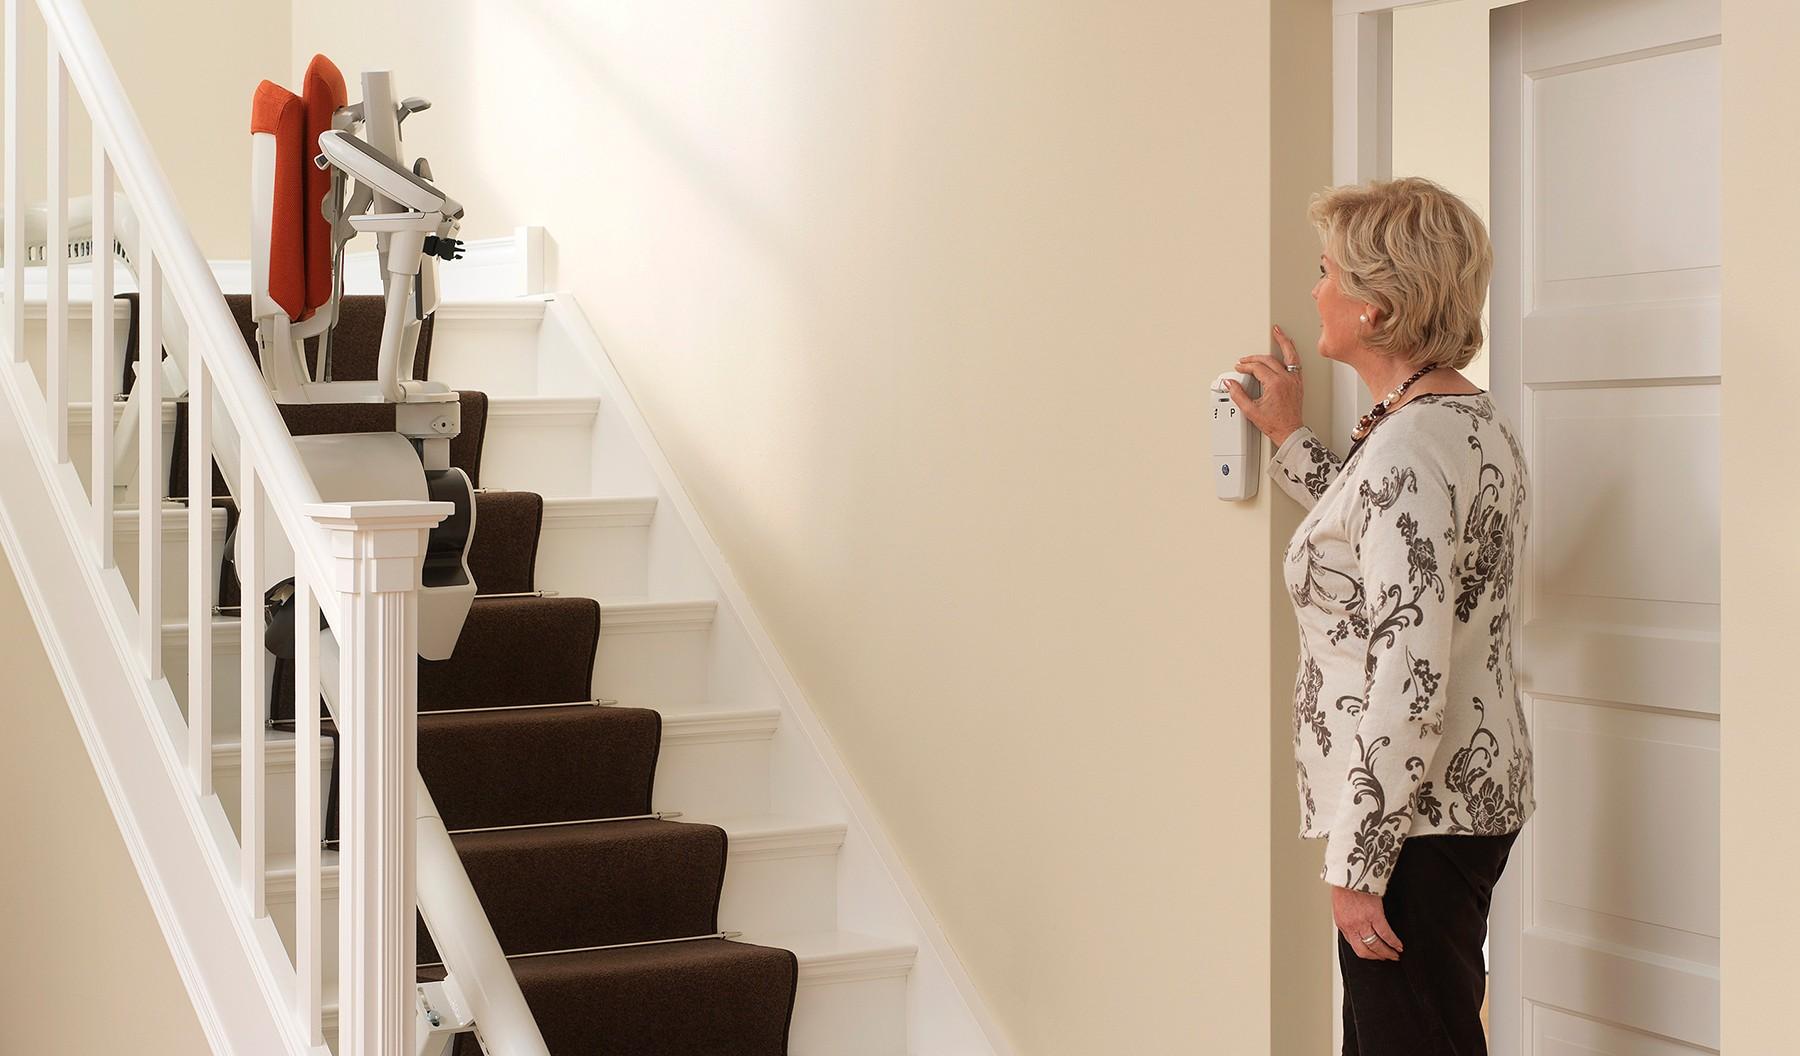 Lifte für kurvige Treppen